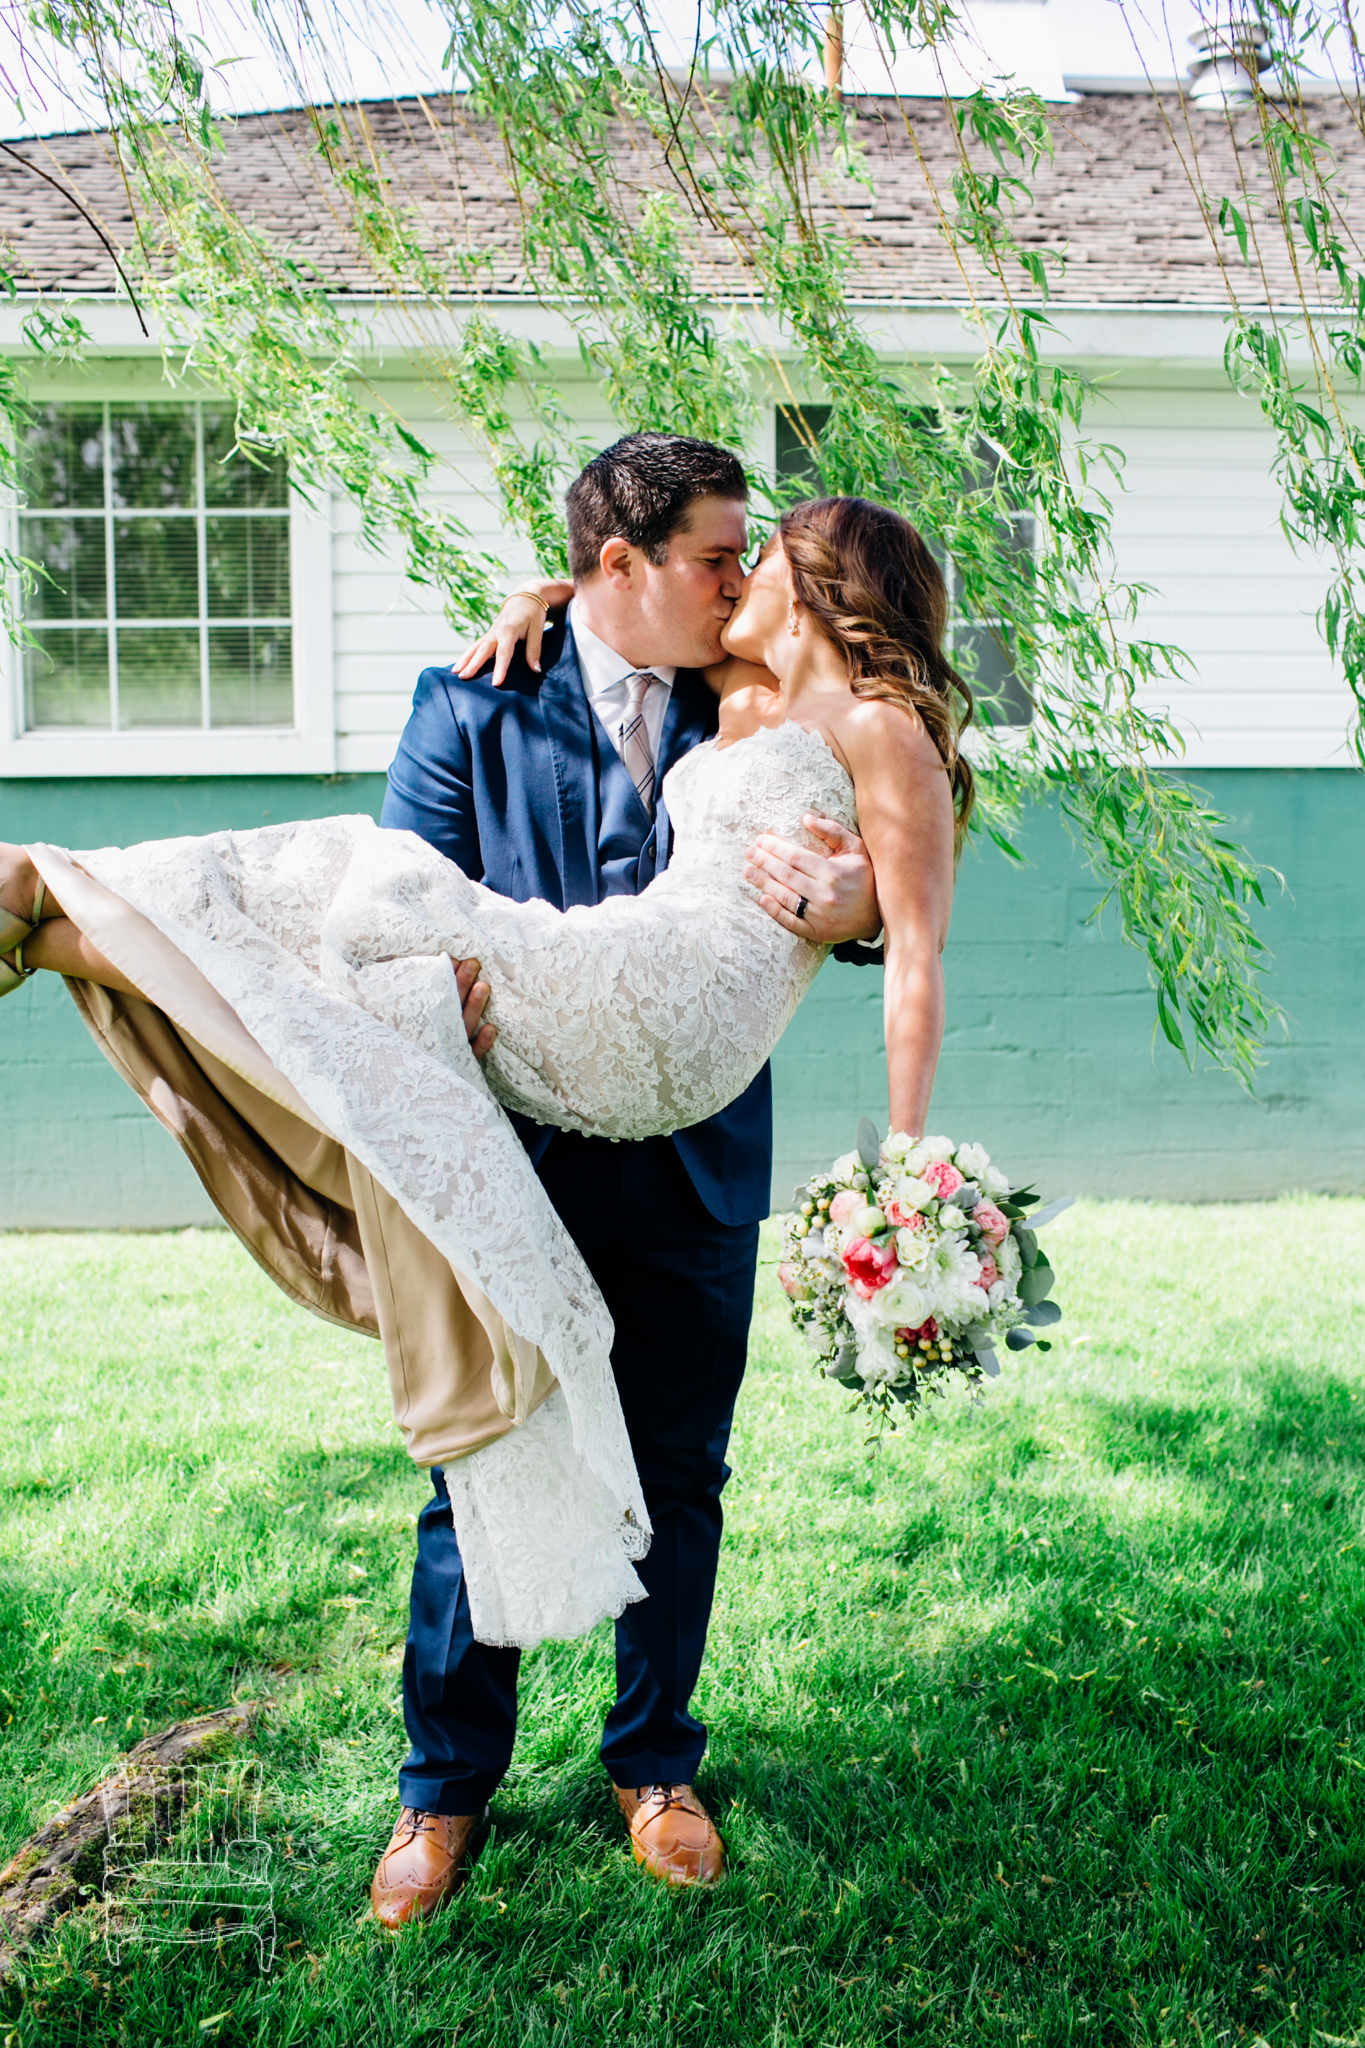 seattle-wedding-photographer-katheryn-moran-russells-bothell-wilkins-wedding-photo-21.jpg